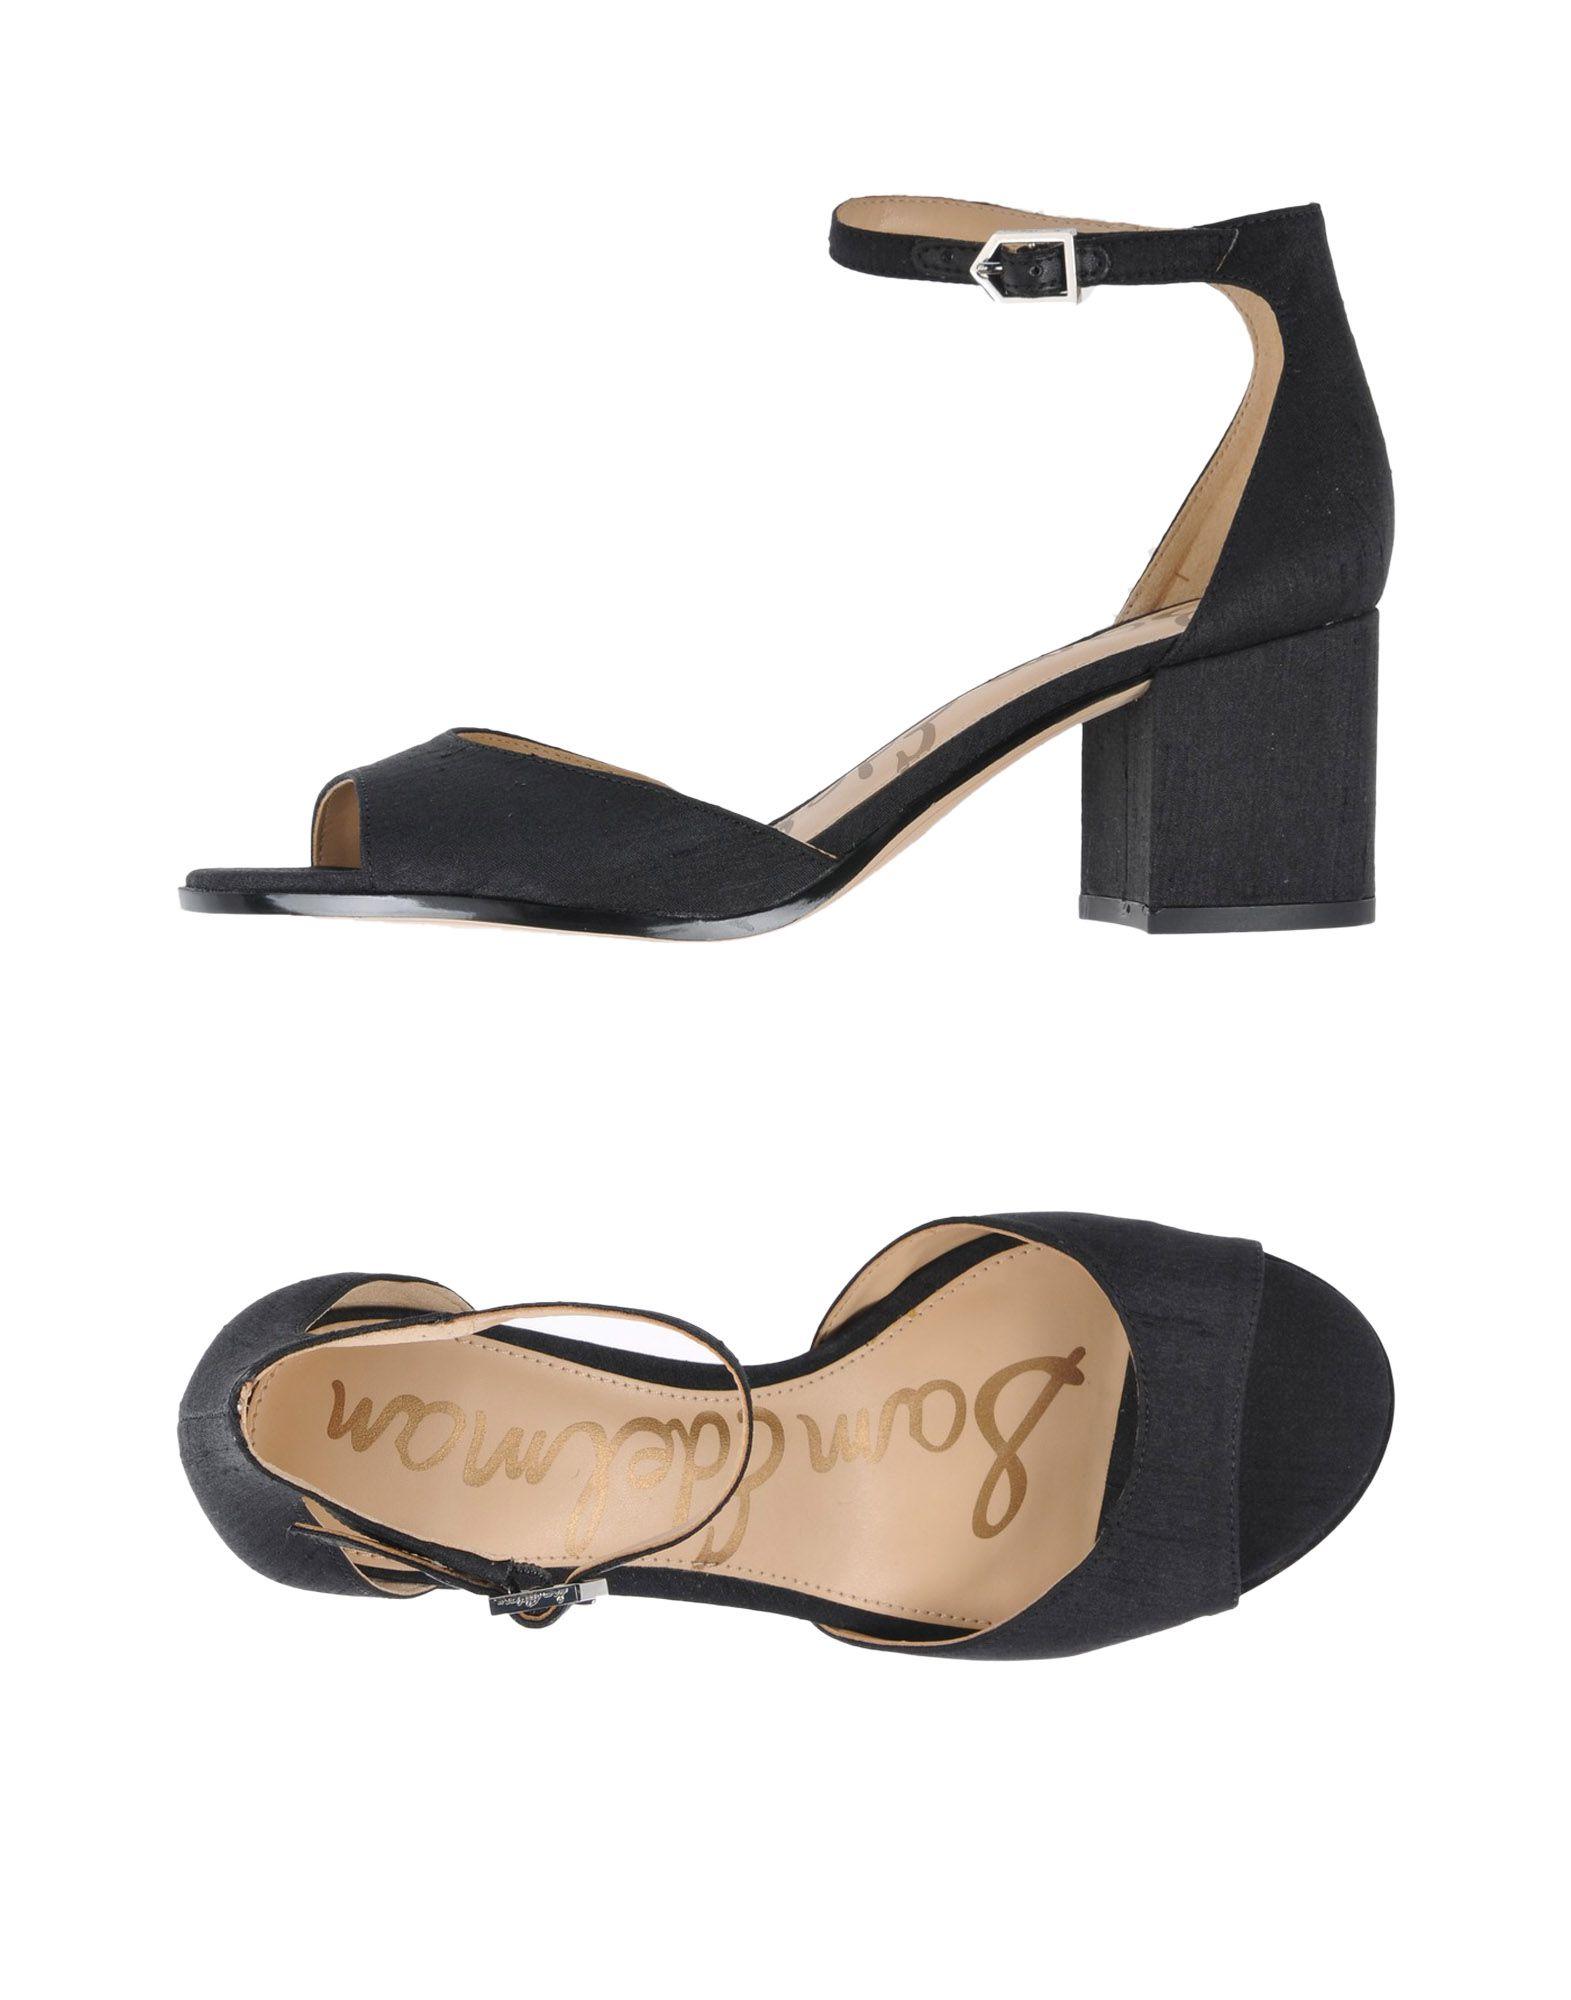 Sam Edelman Edelman Sandals - Women Sam Edelman Edelman Sandals online on  Australia - 11475413VM 2e0a55